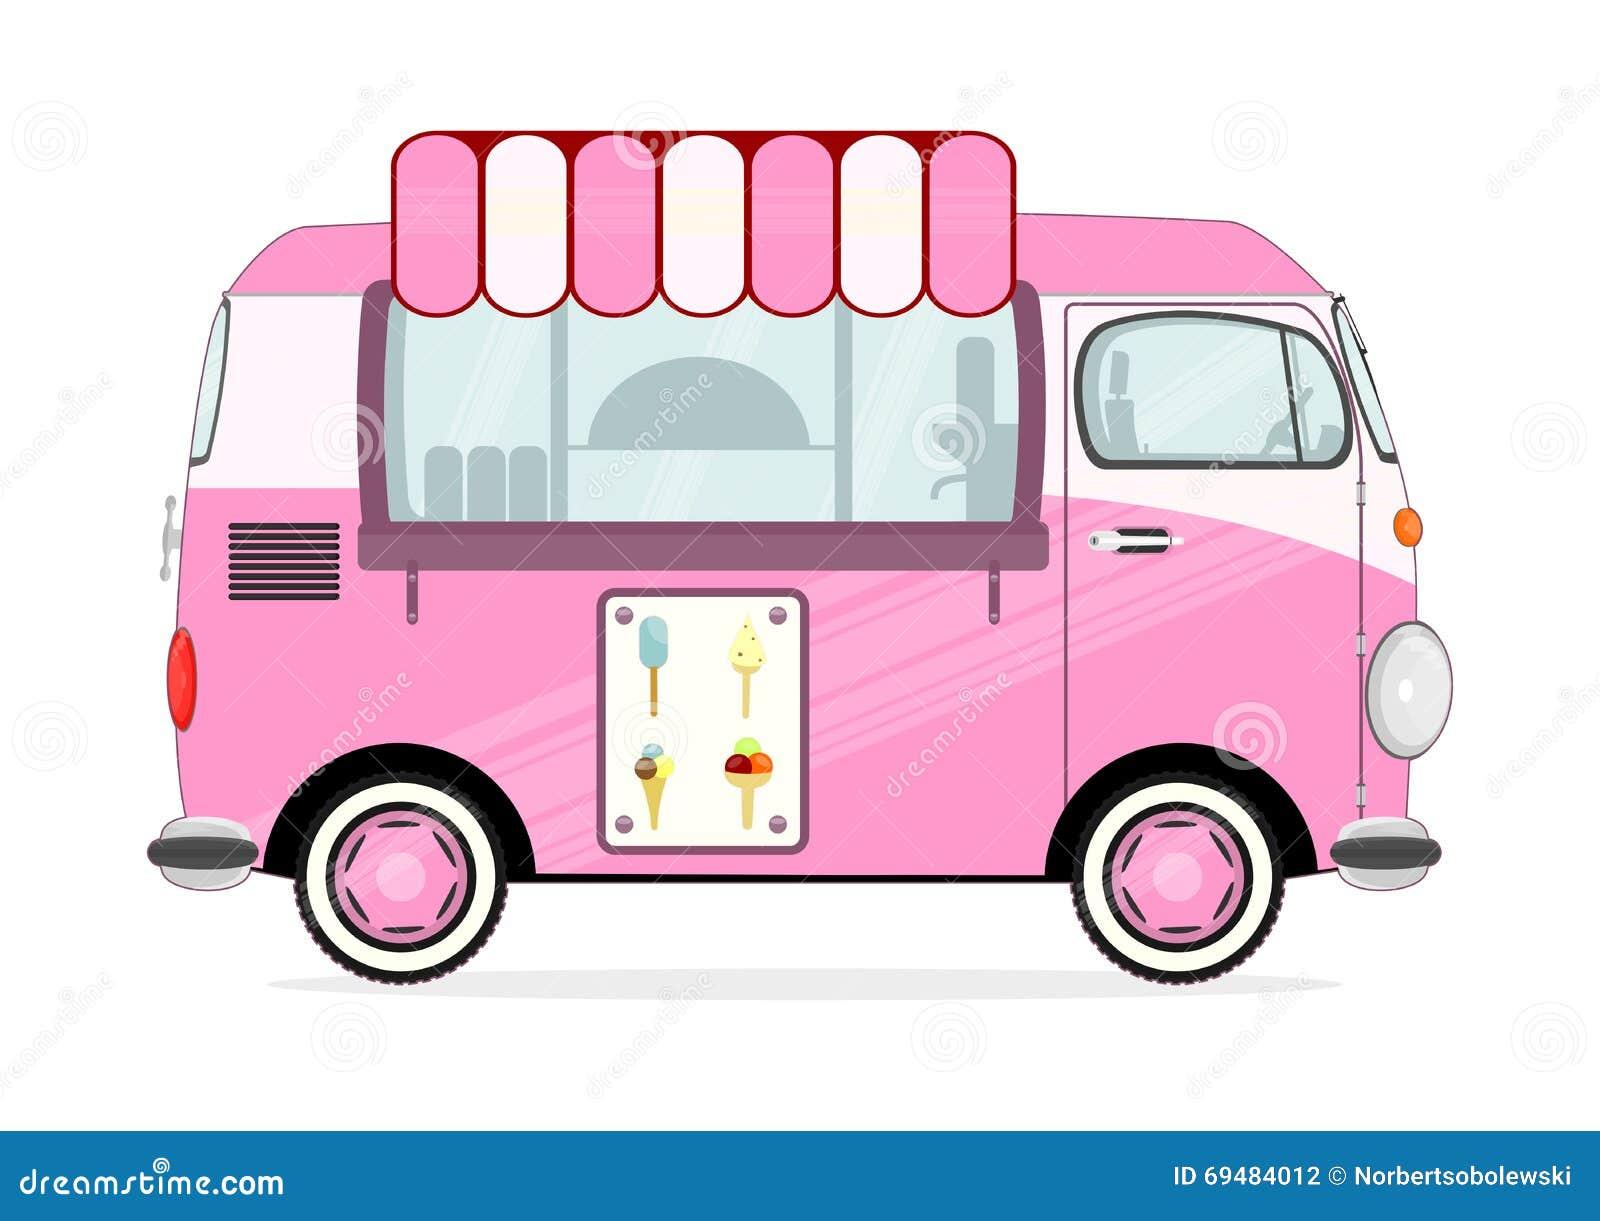 ice cream van stock illustrations 1 050 ice cream van stock rh dreamstime com clipart ice cream truck images ice cream truck clip art free